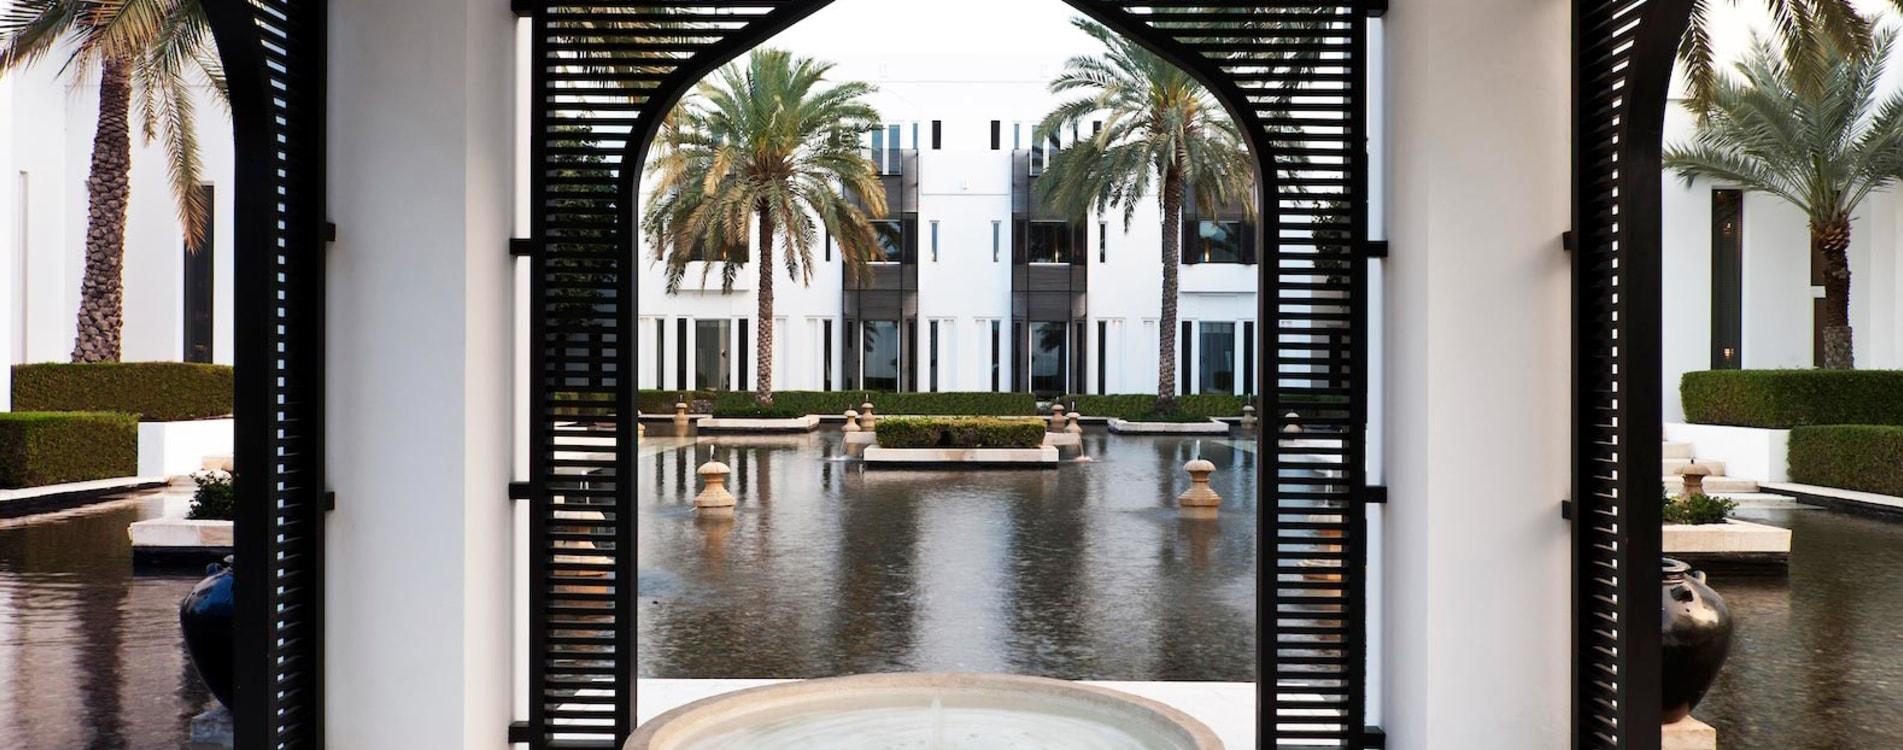 Chedi-Muscat-Overview-Water-Garden.jpg